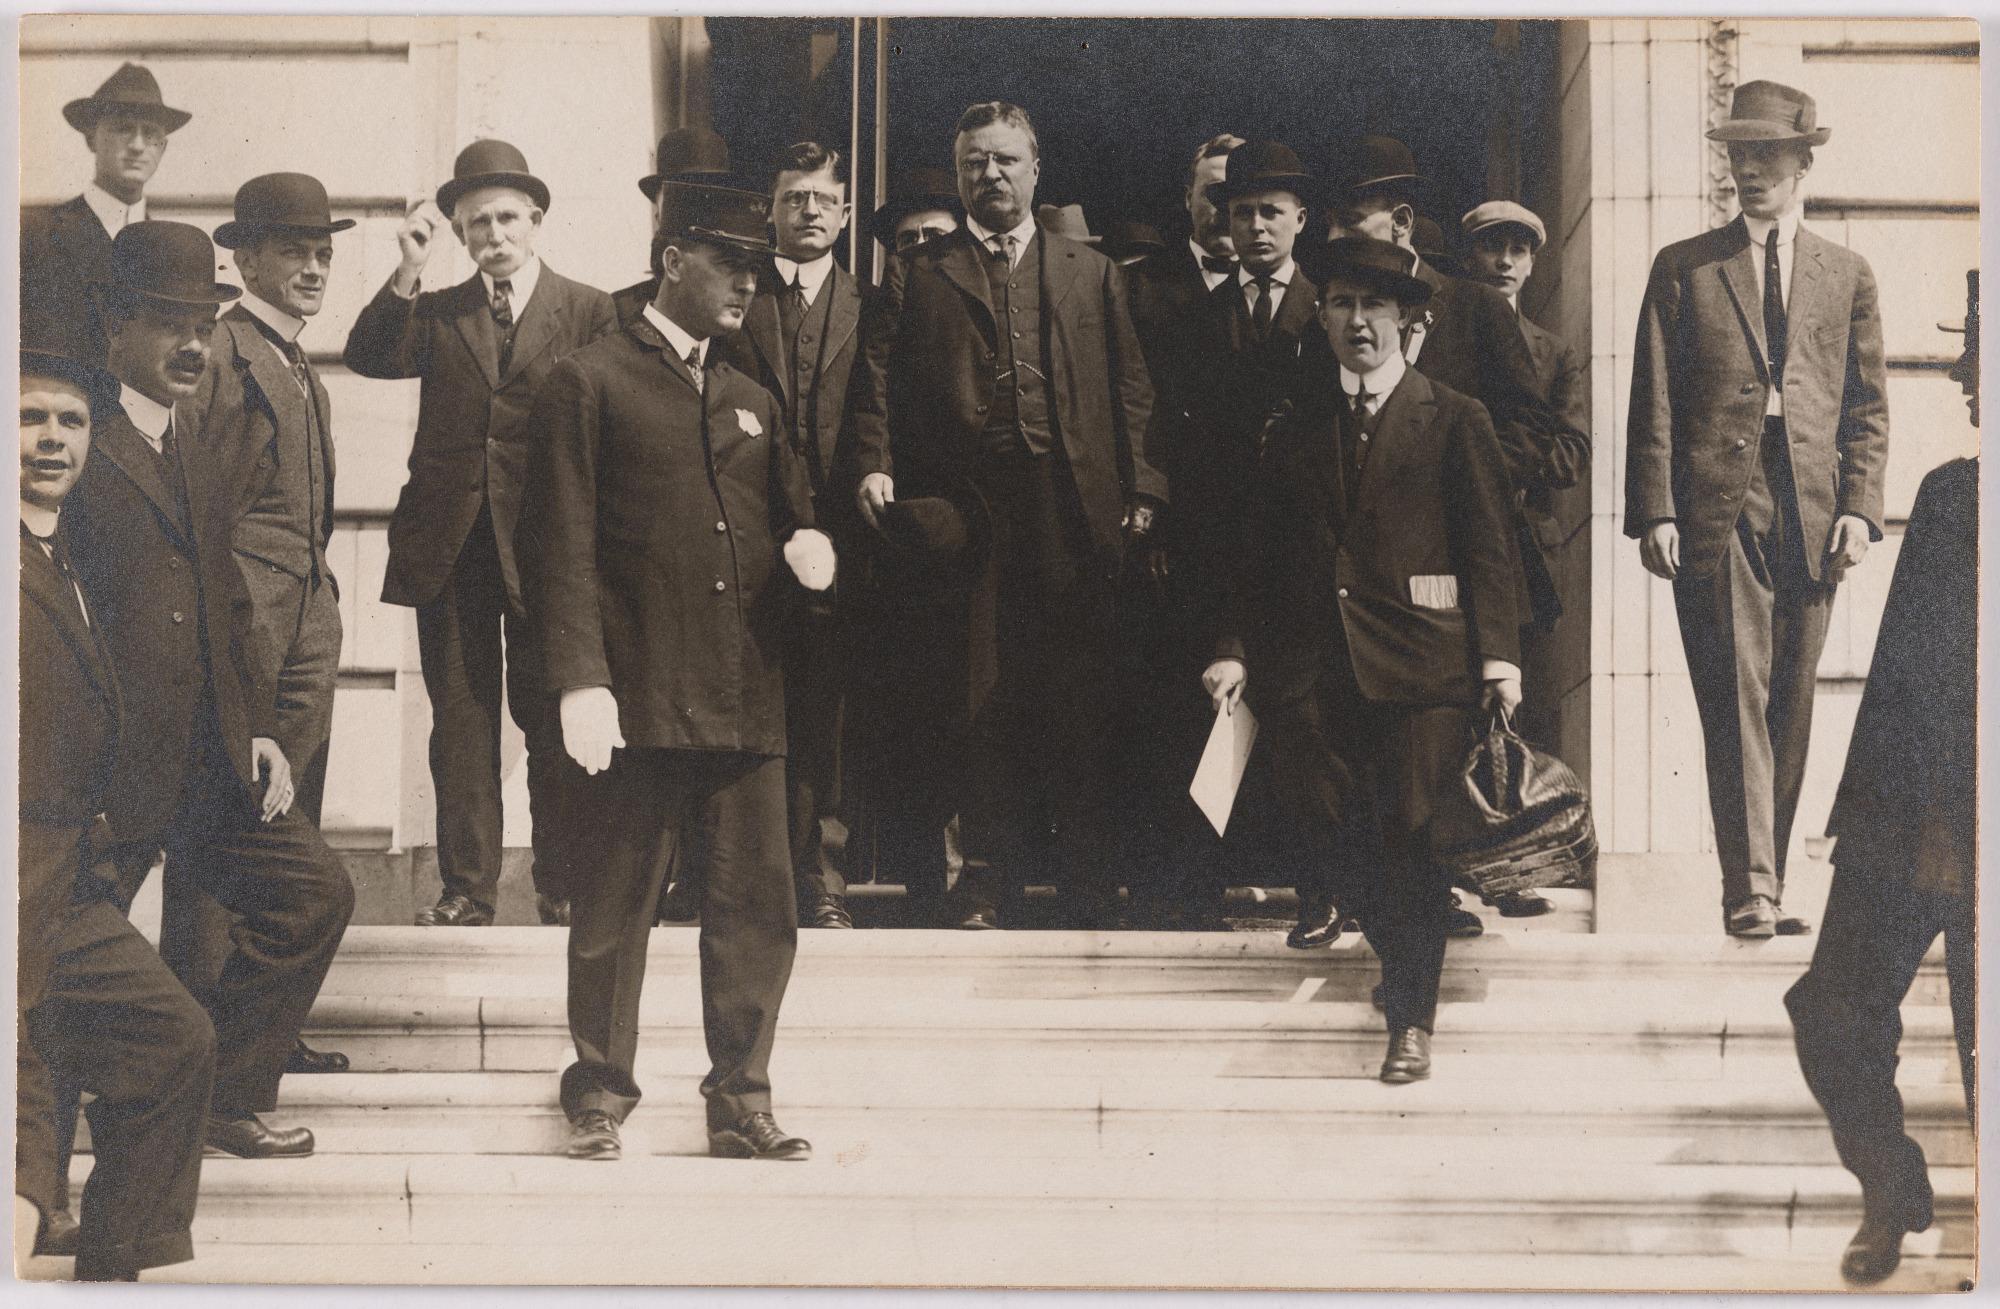 Theodore Roosevelt and Frank J. Hogan